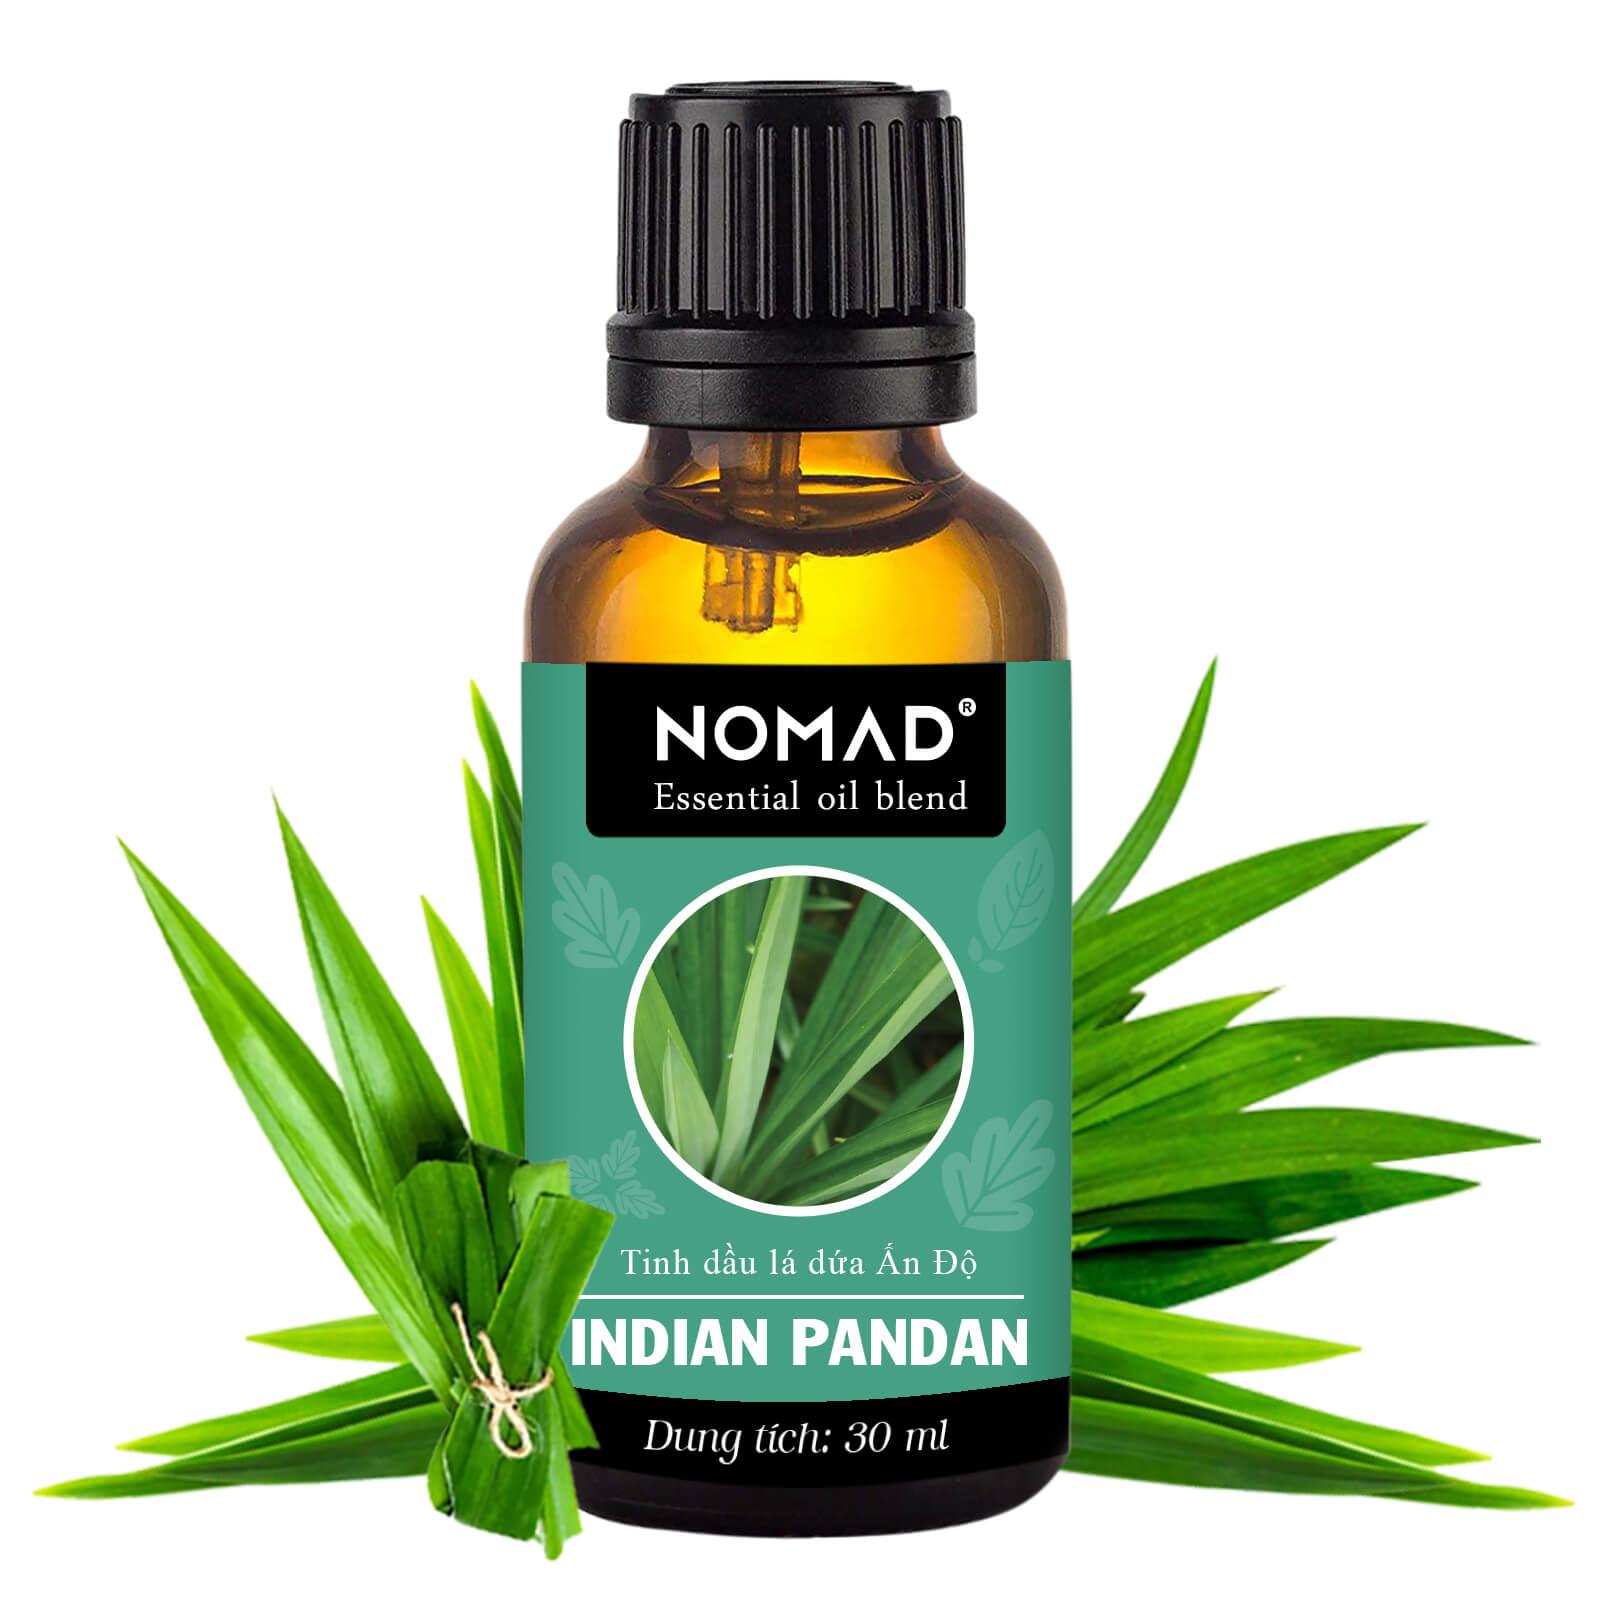 tinh-dau-thien-nhien-la-dua-an-do-nomad-essential-oil-blend-indian-pandan